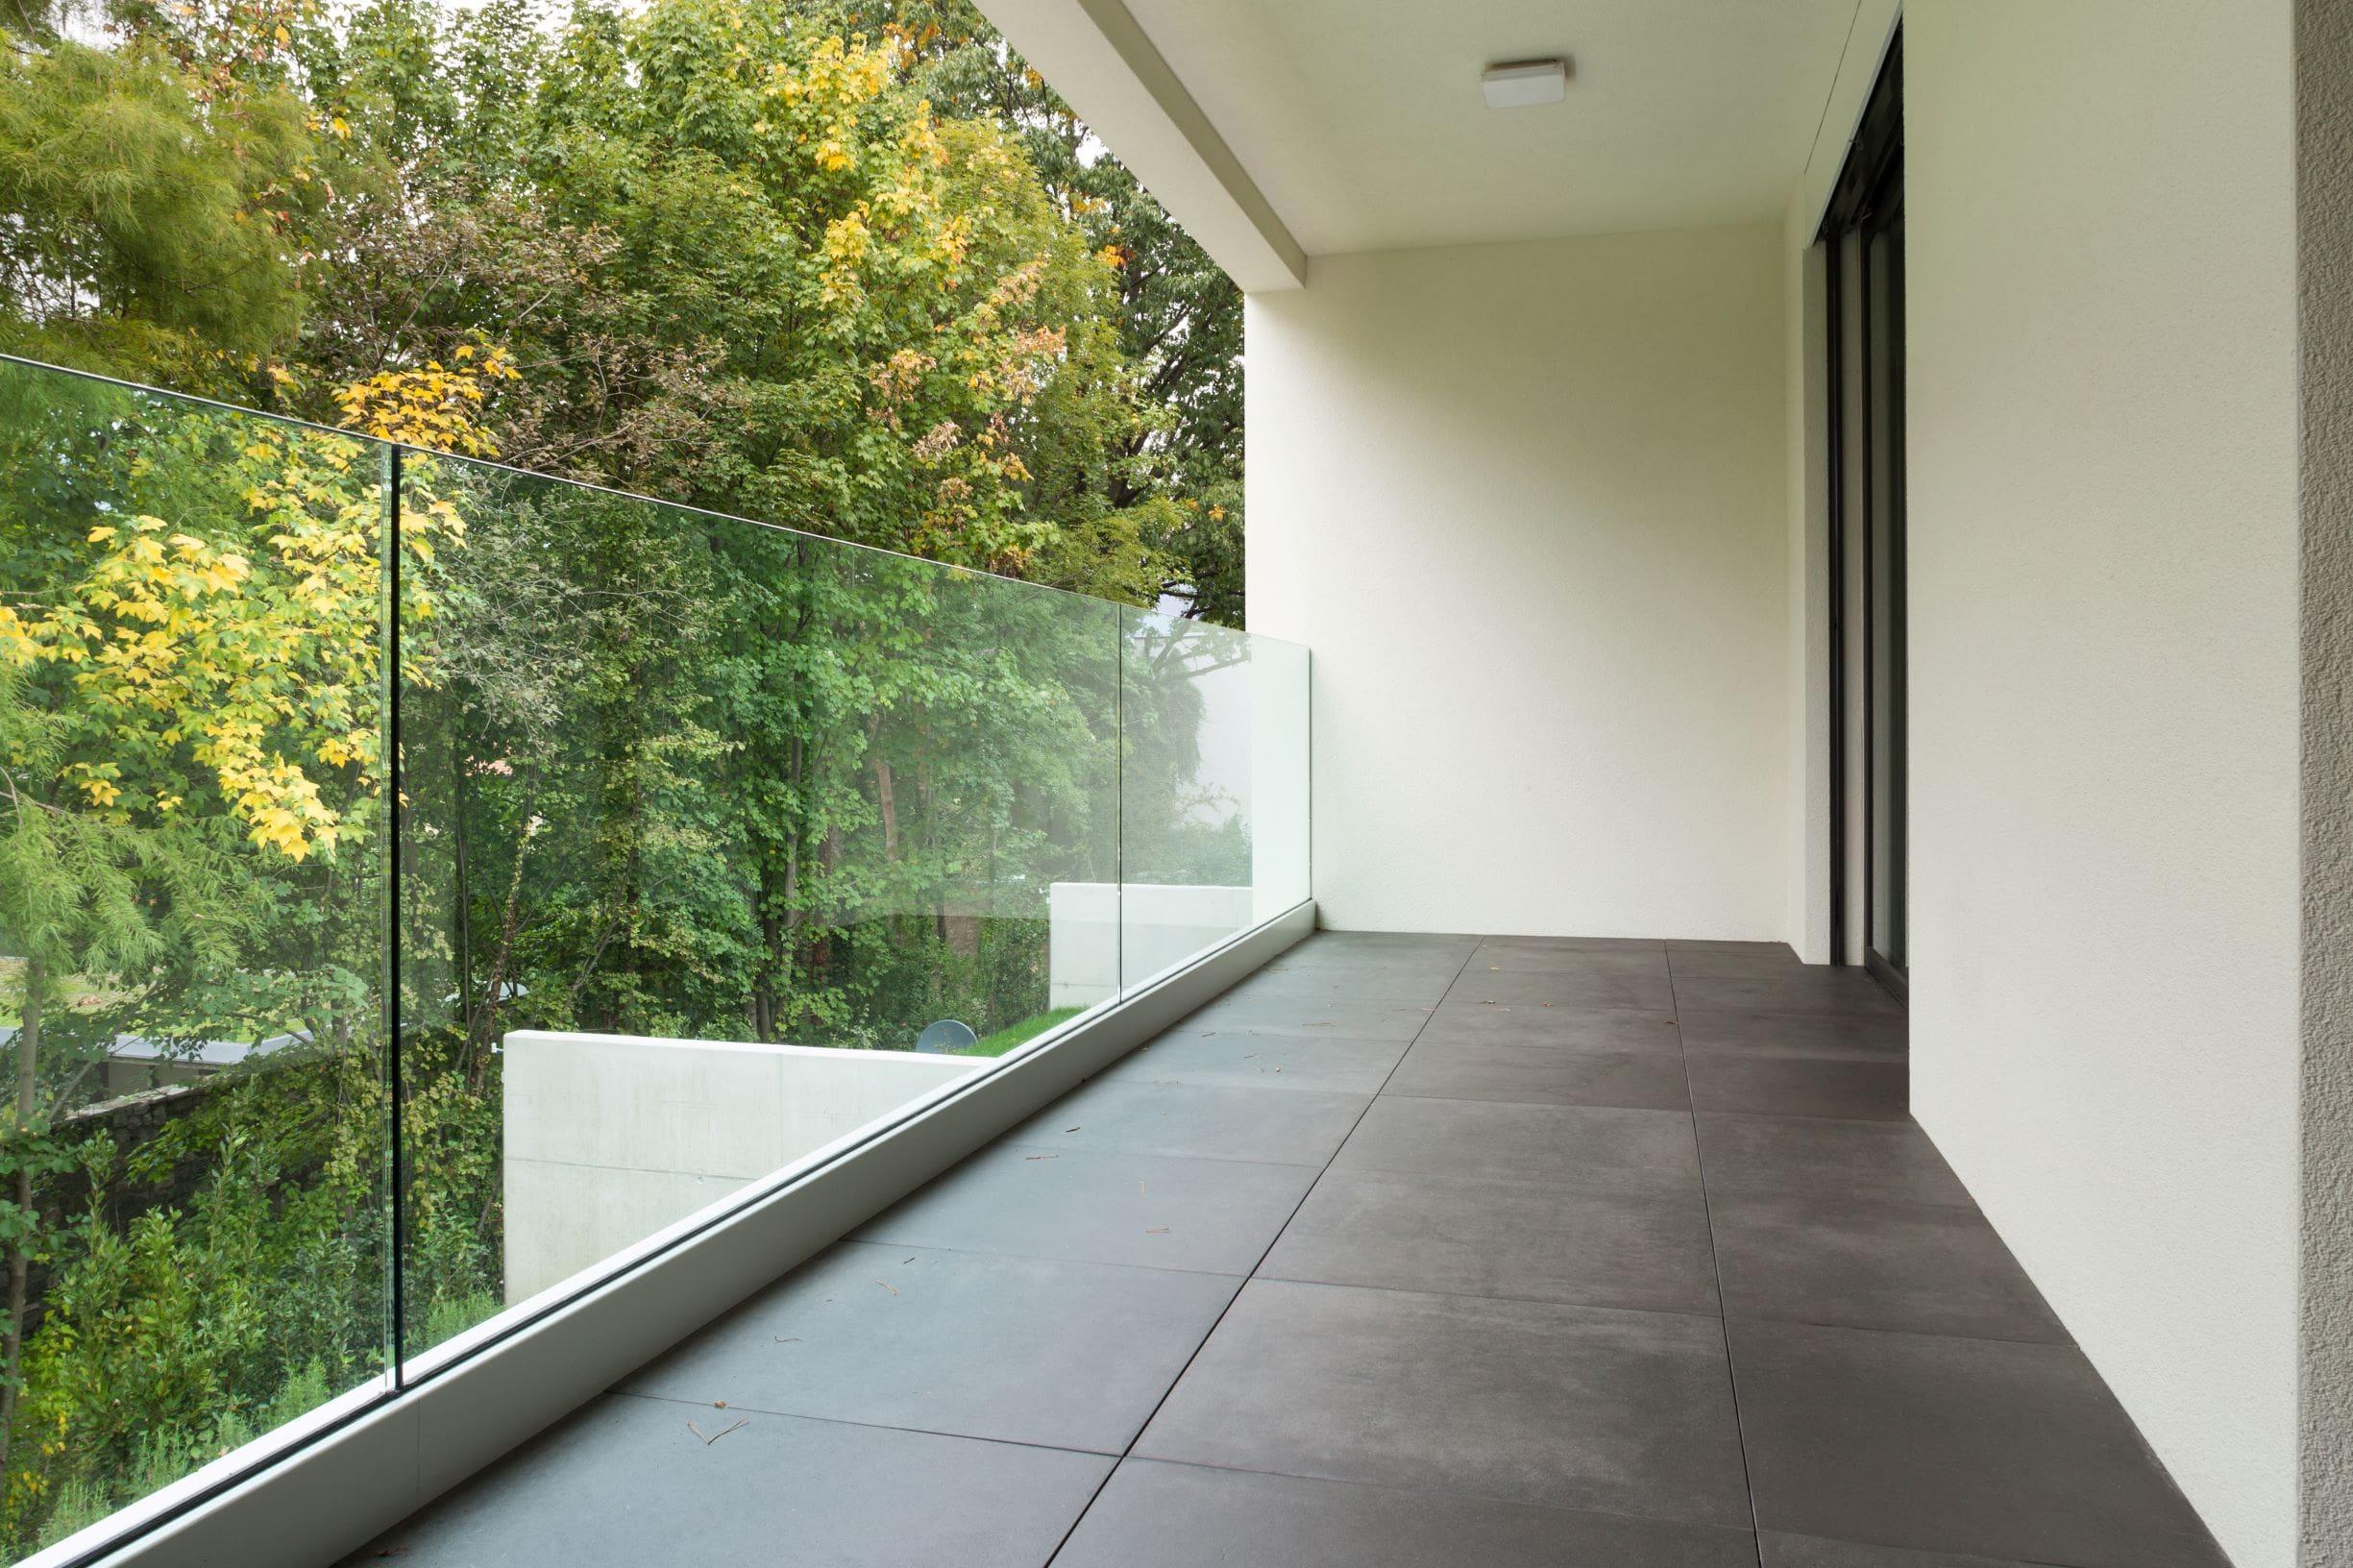 glass-balcony-fence-nelson-richmond-glass.jpeg